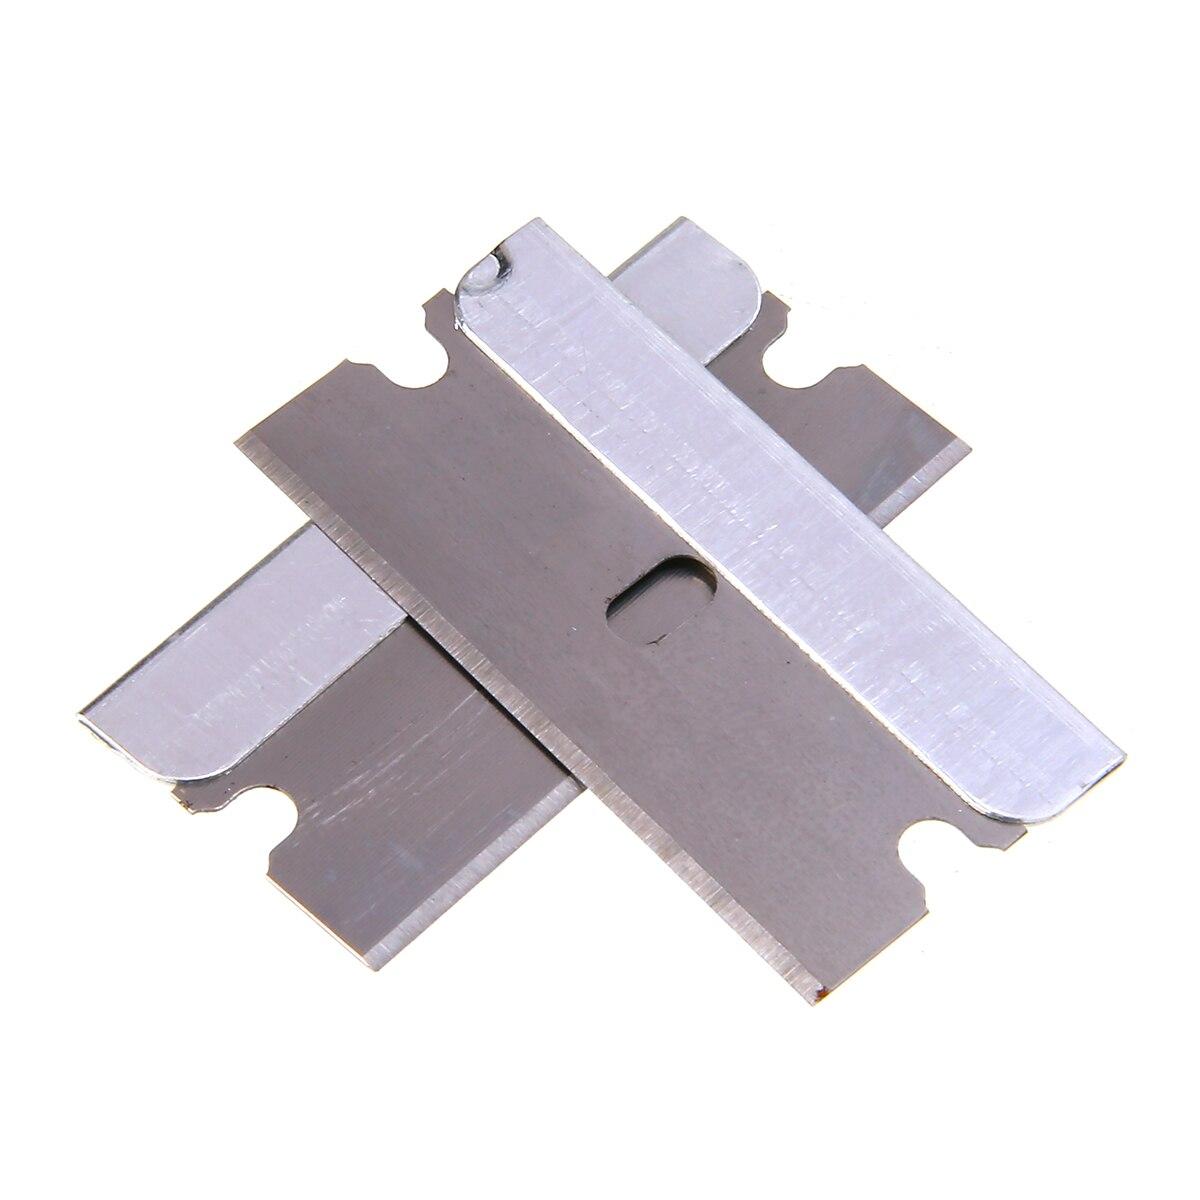 Durable 100pcs/set Auto Film Special Glass Removal Blade Carbon Steel Razor Blade Single Edge For Window Fish Tank Mayitr